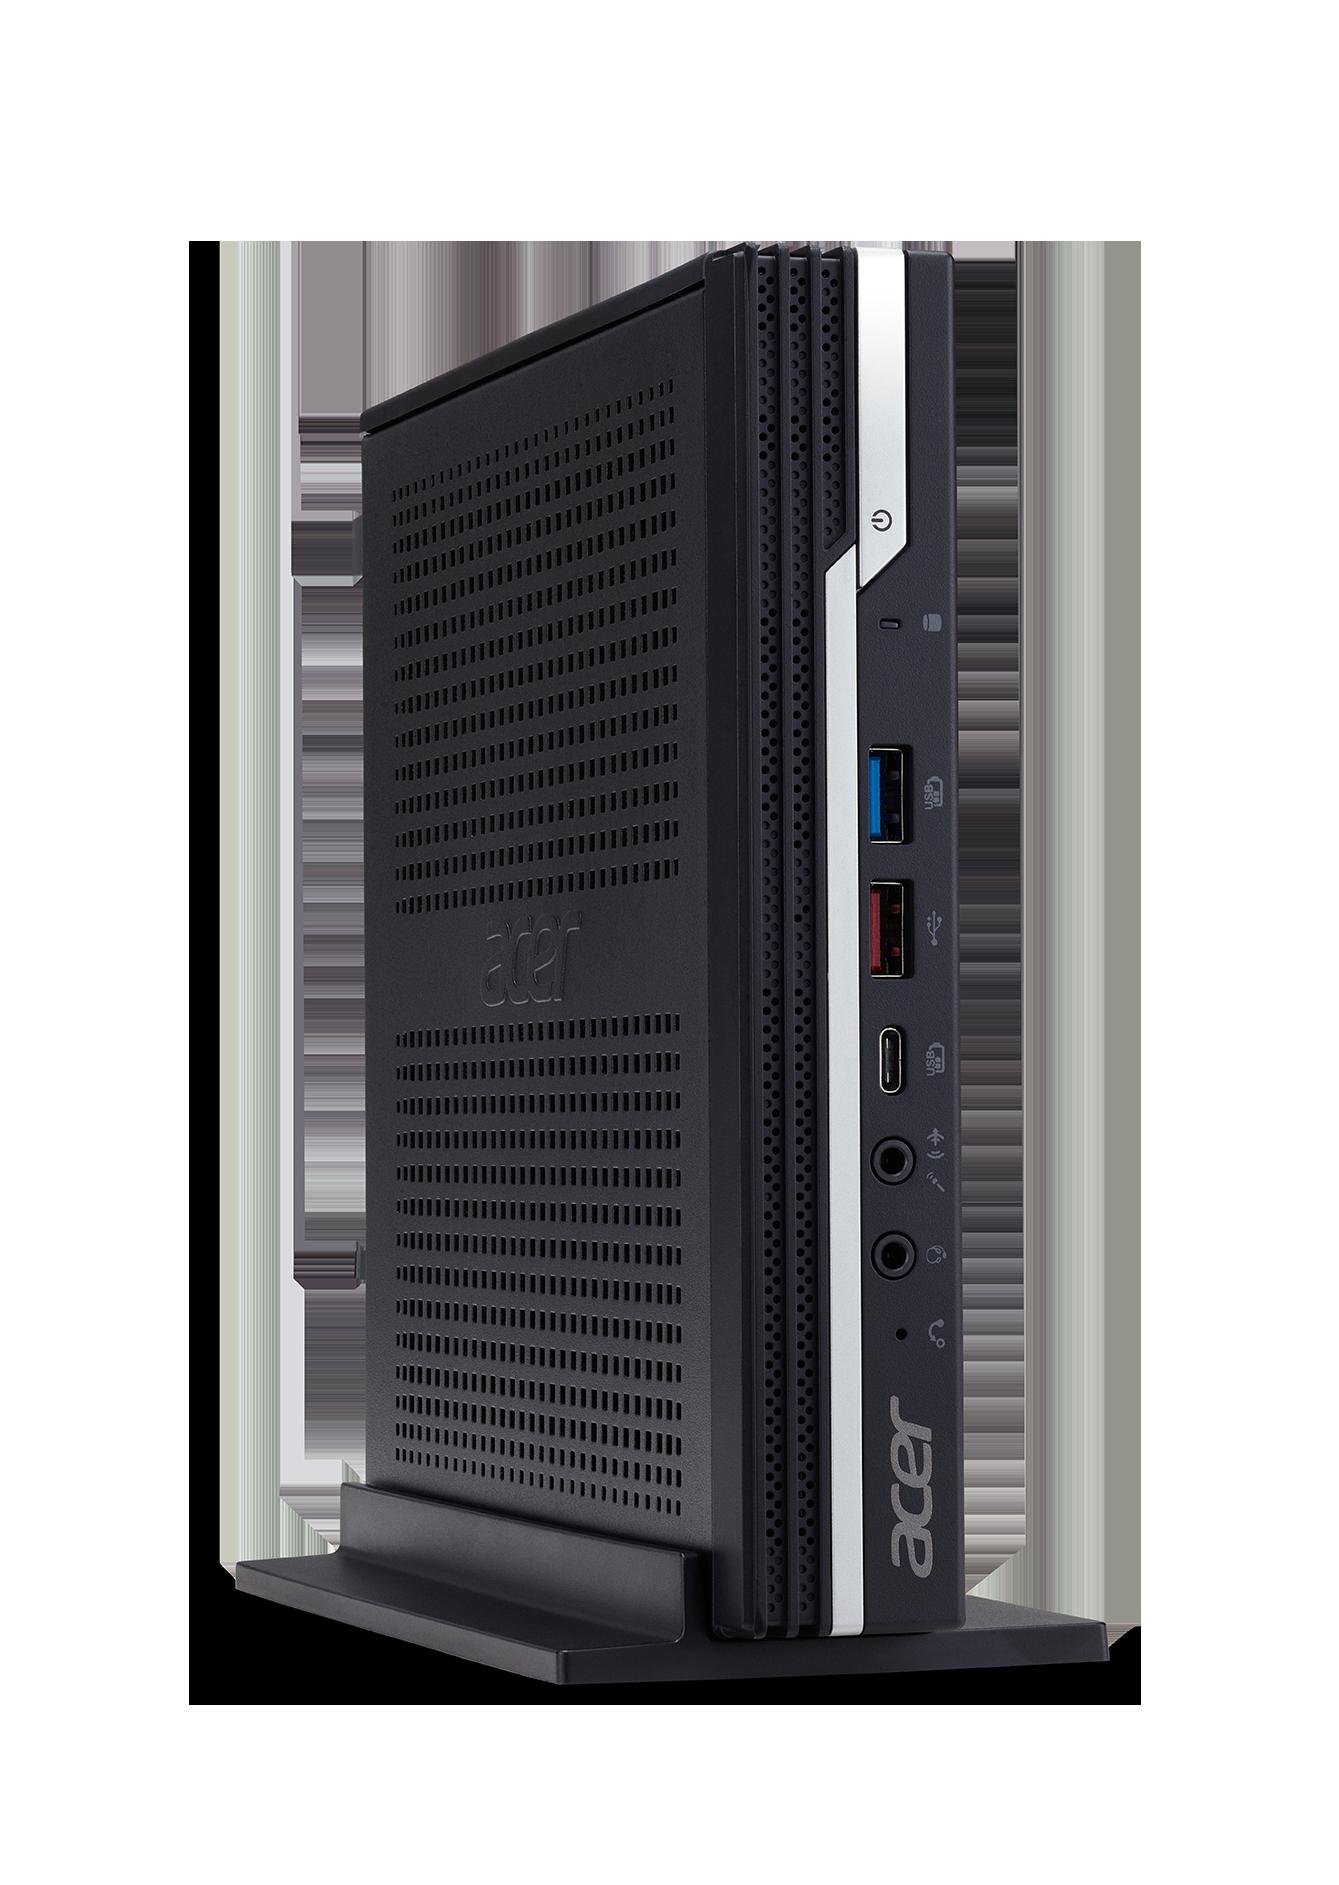 Acer Veriton N (VN4670GT) - i5-10400T/256SSD/8G/W10Pro - DT.VTZEC.004